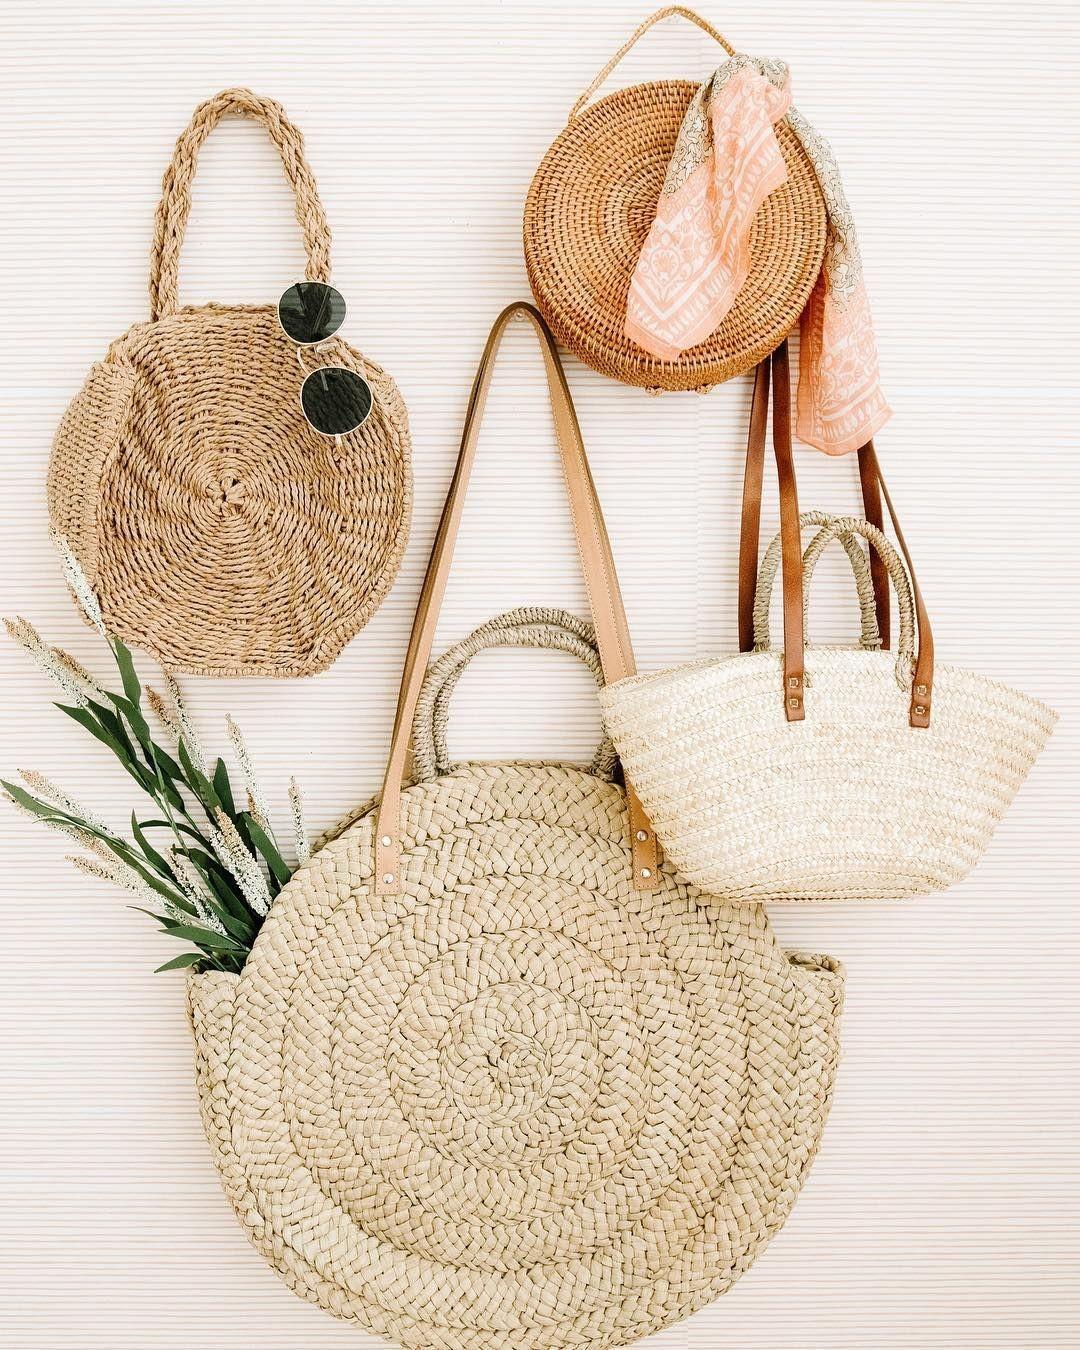 Trend Alert: Straw Bags